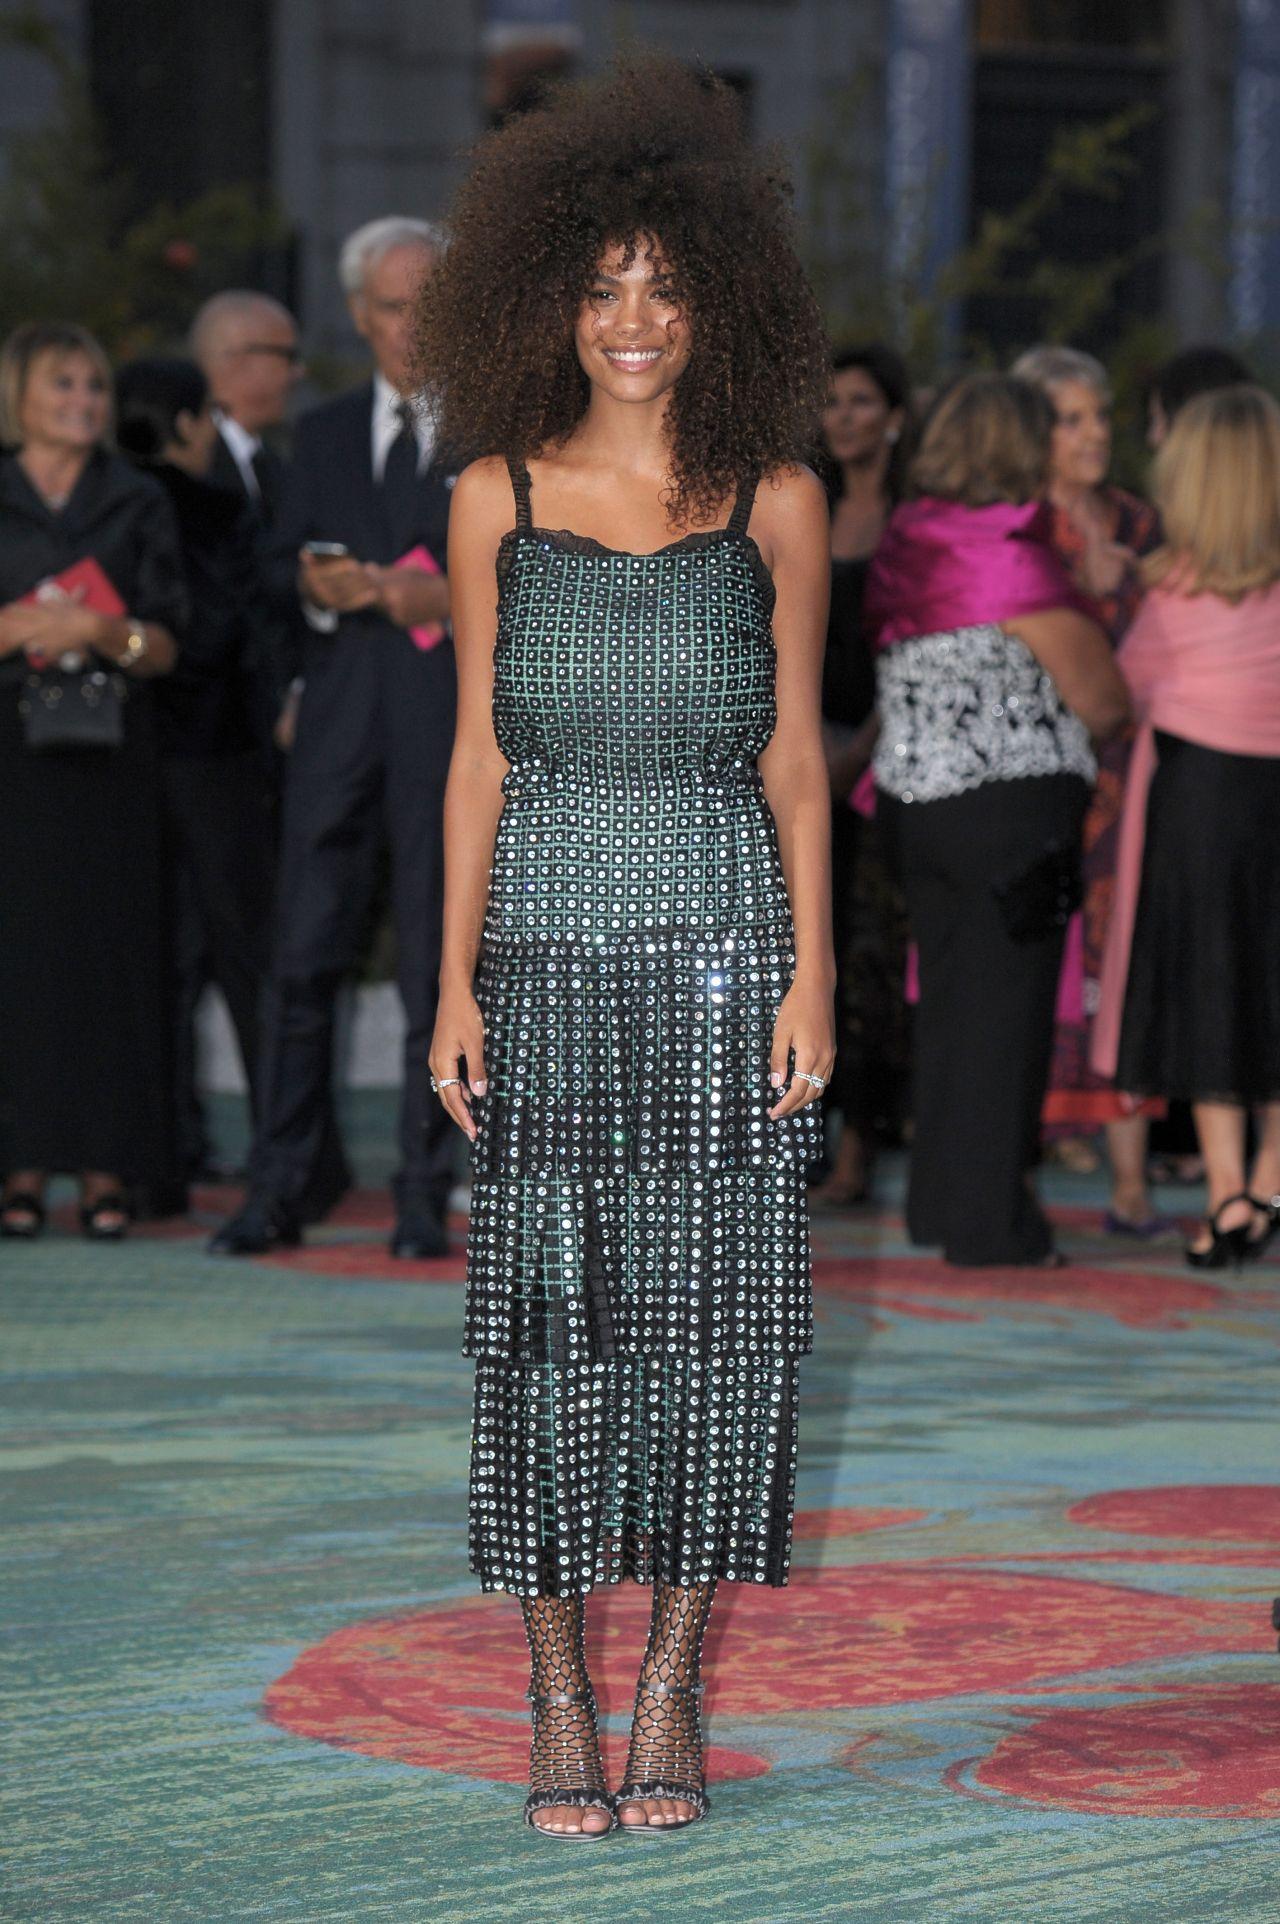 Fashion Awards 2017 In London: Green Carpet Fashion Awards, Italia